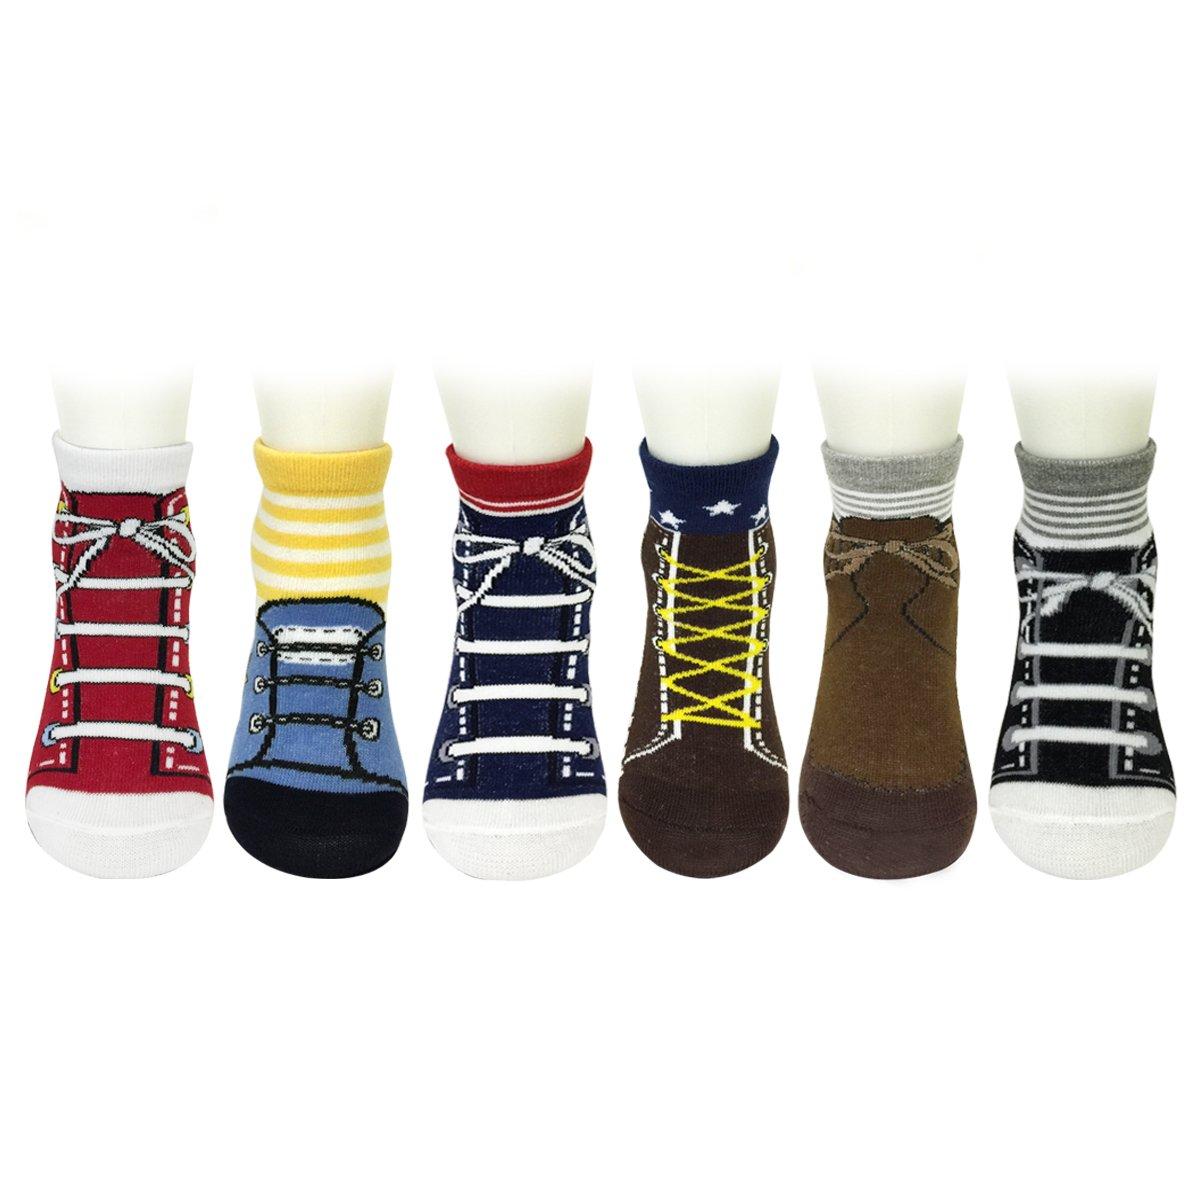 Baby 6 Pair Looks like Shoes Socks